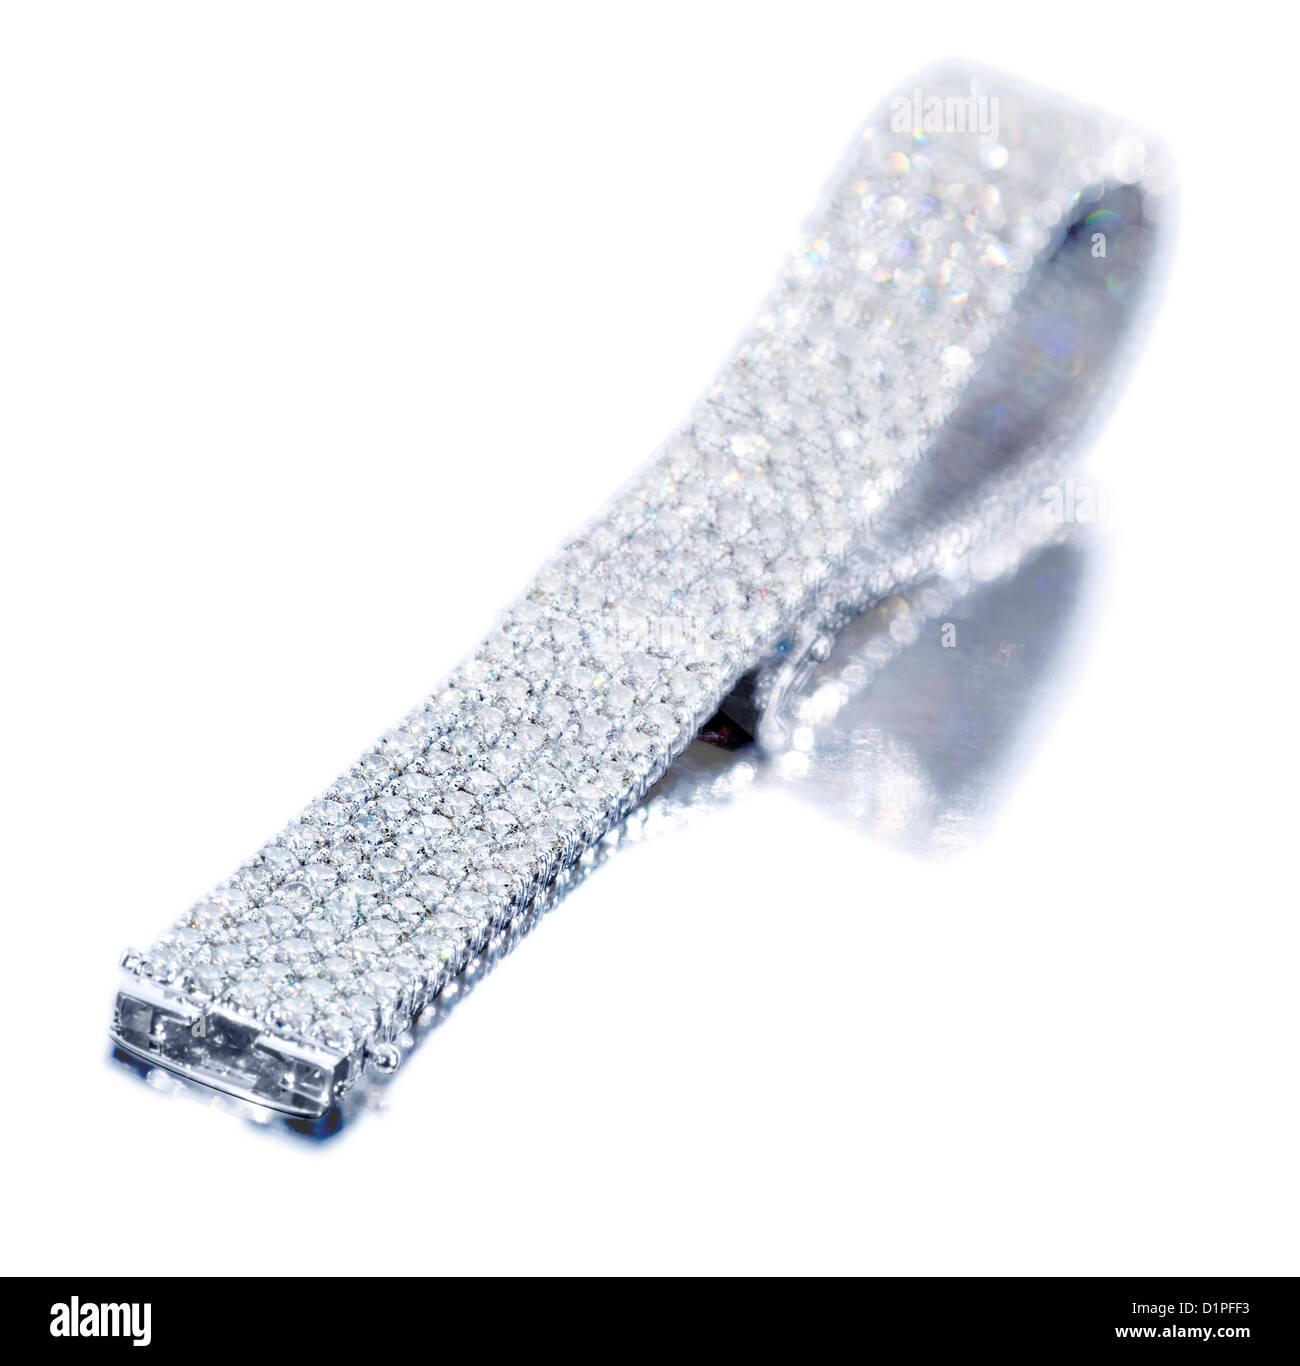 Diamond bracelet against white background - Stock Image